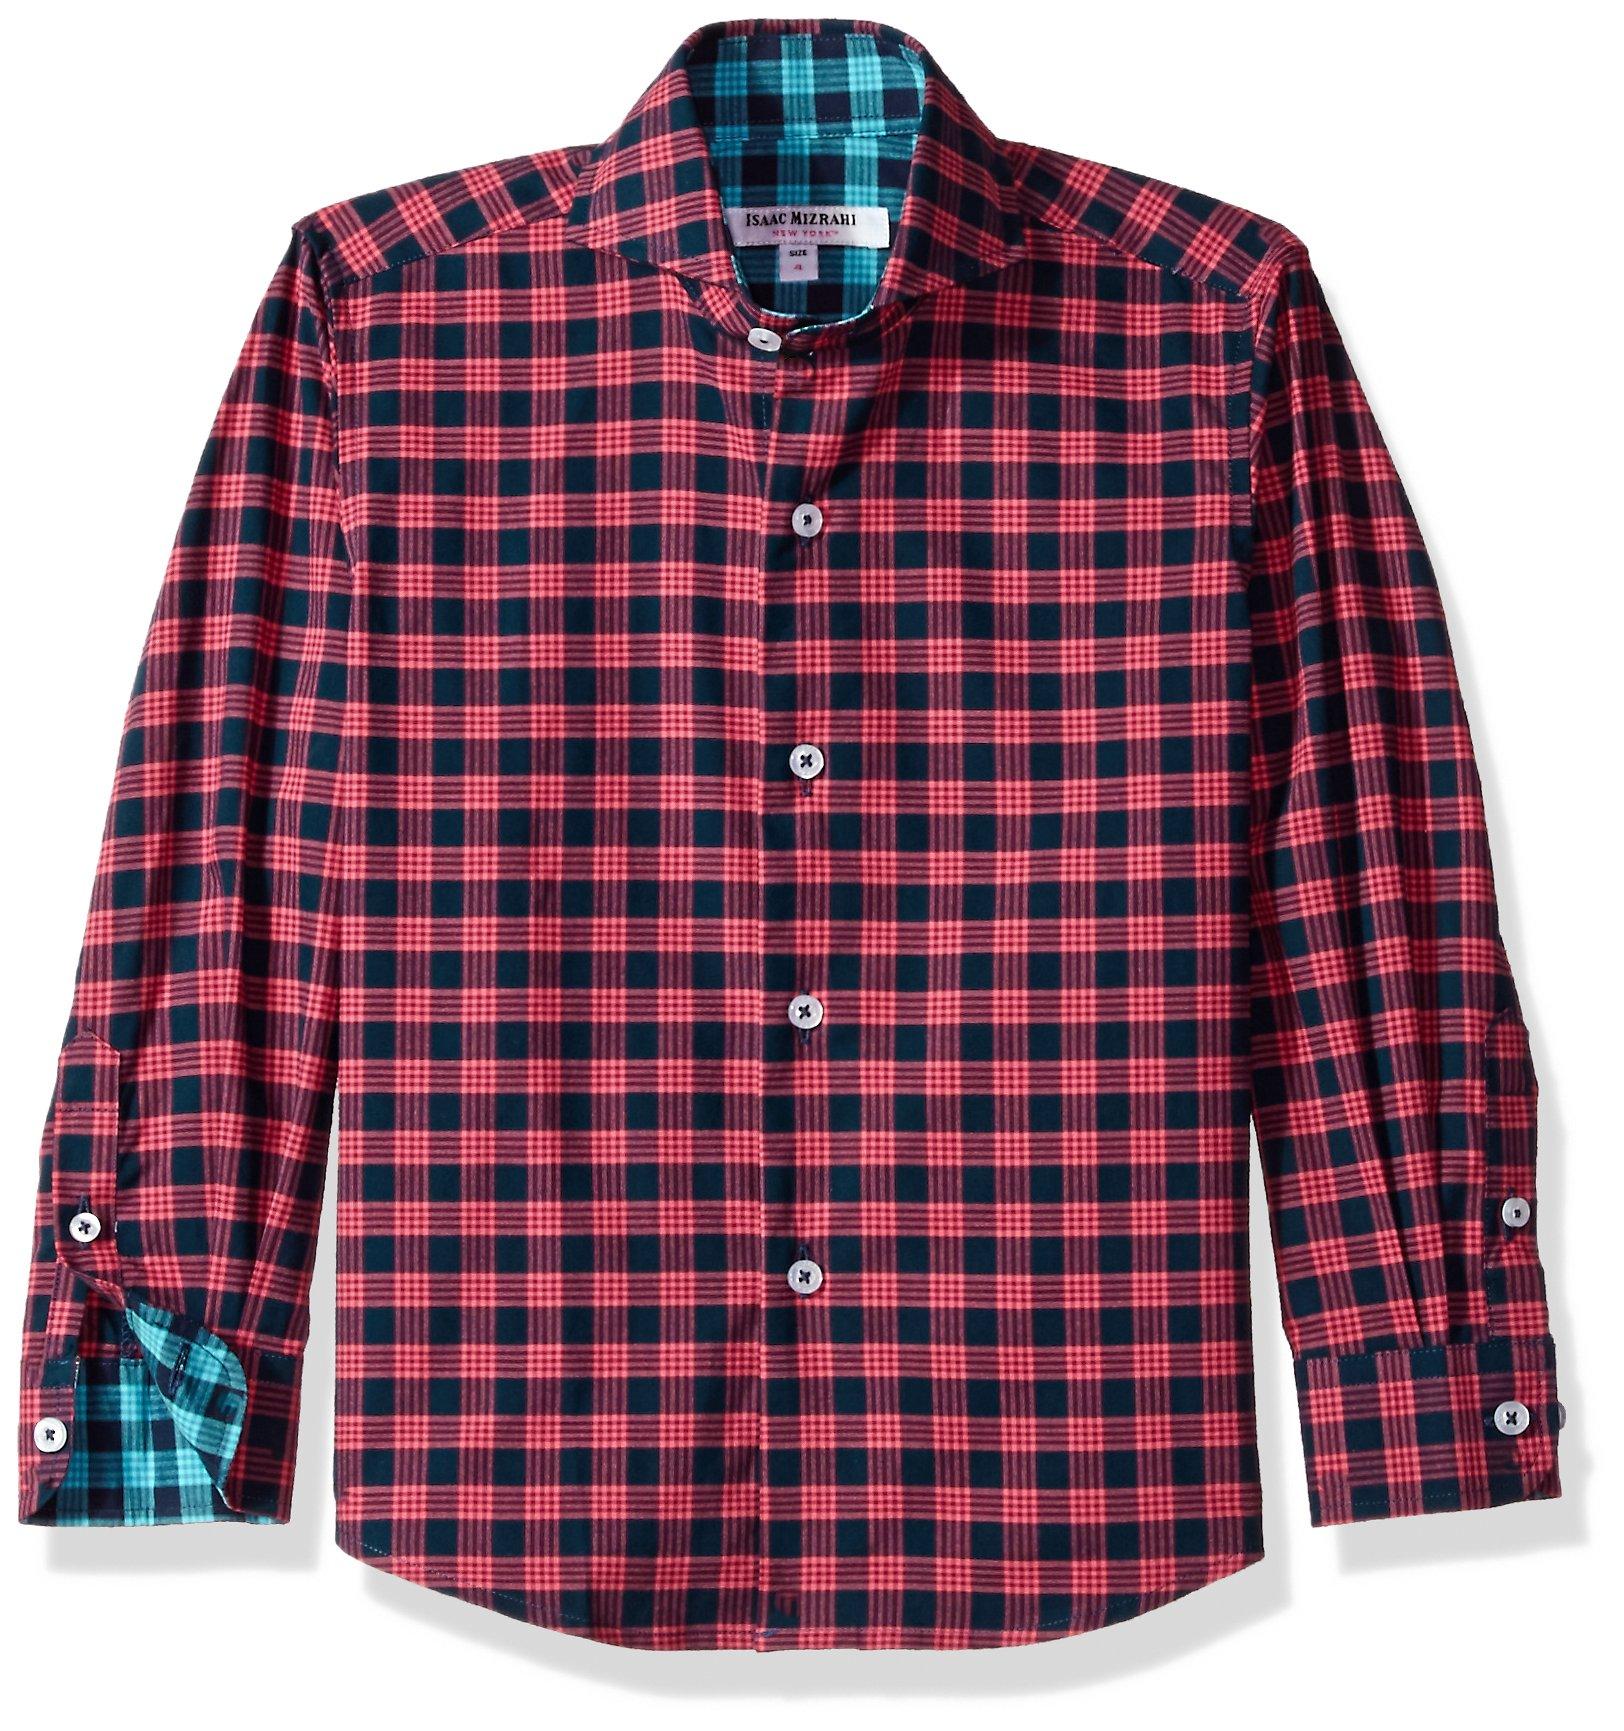 Isaac Mizrahi Big Boys' Cotton Multi Plaid Button Down, Red/Navy, 18/20